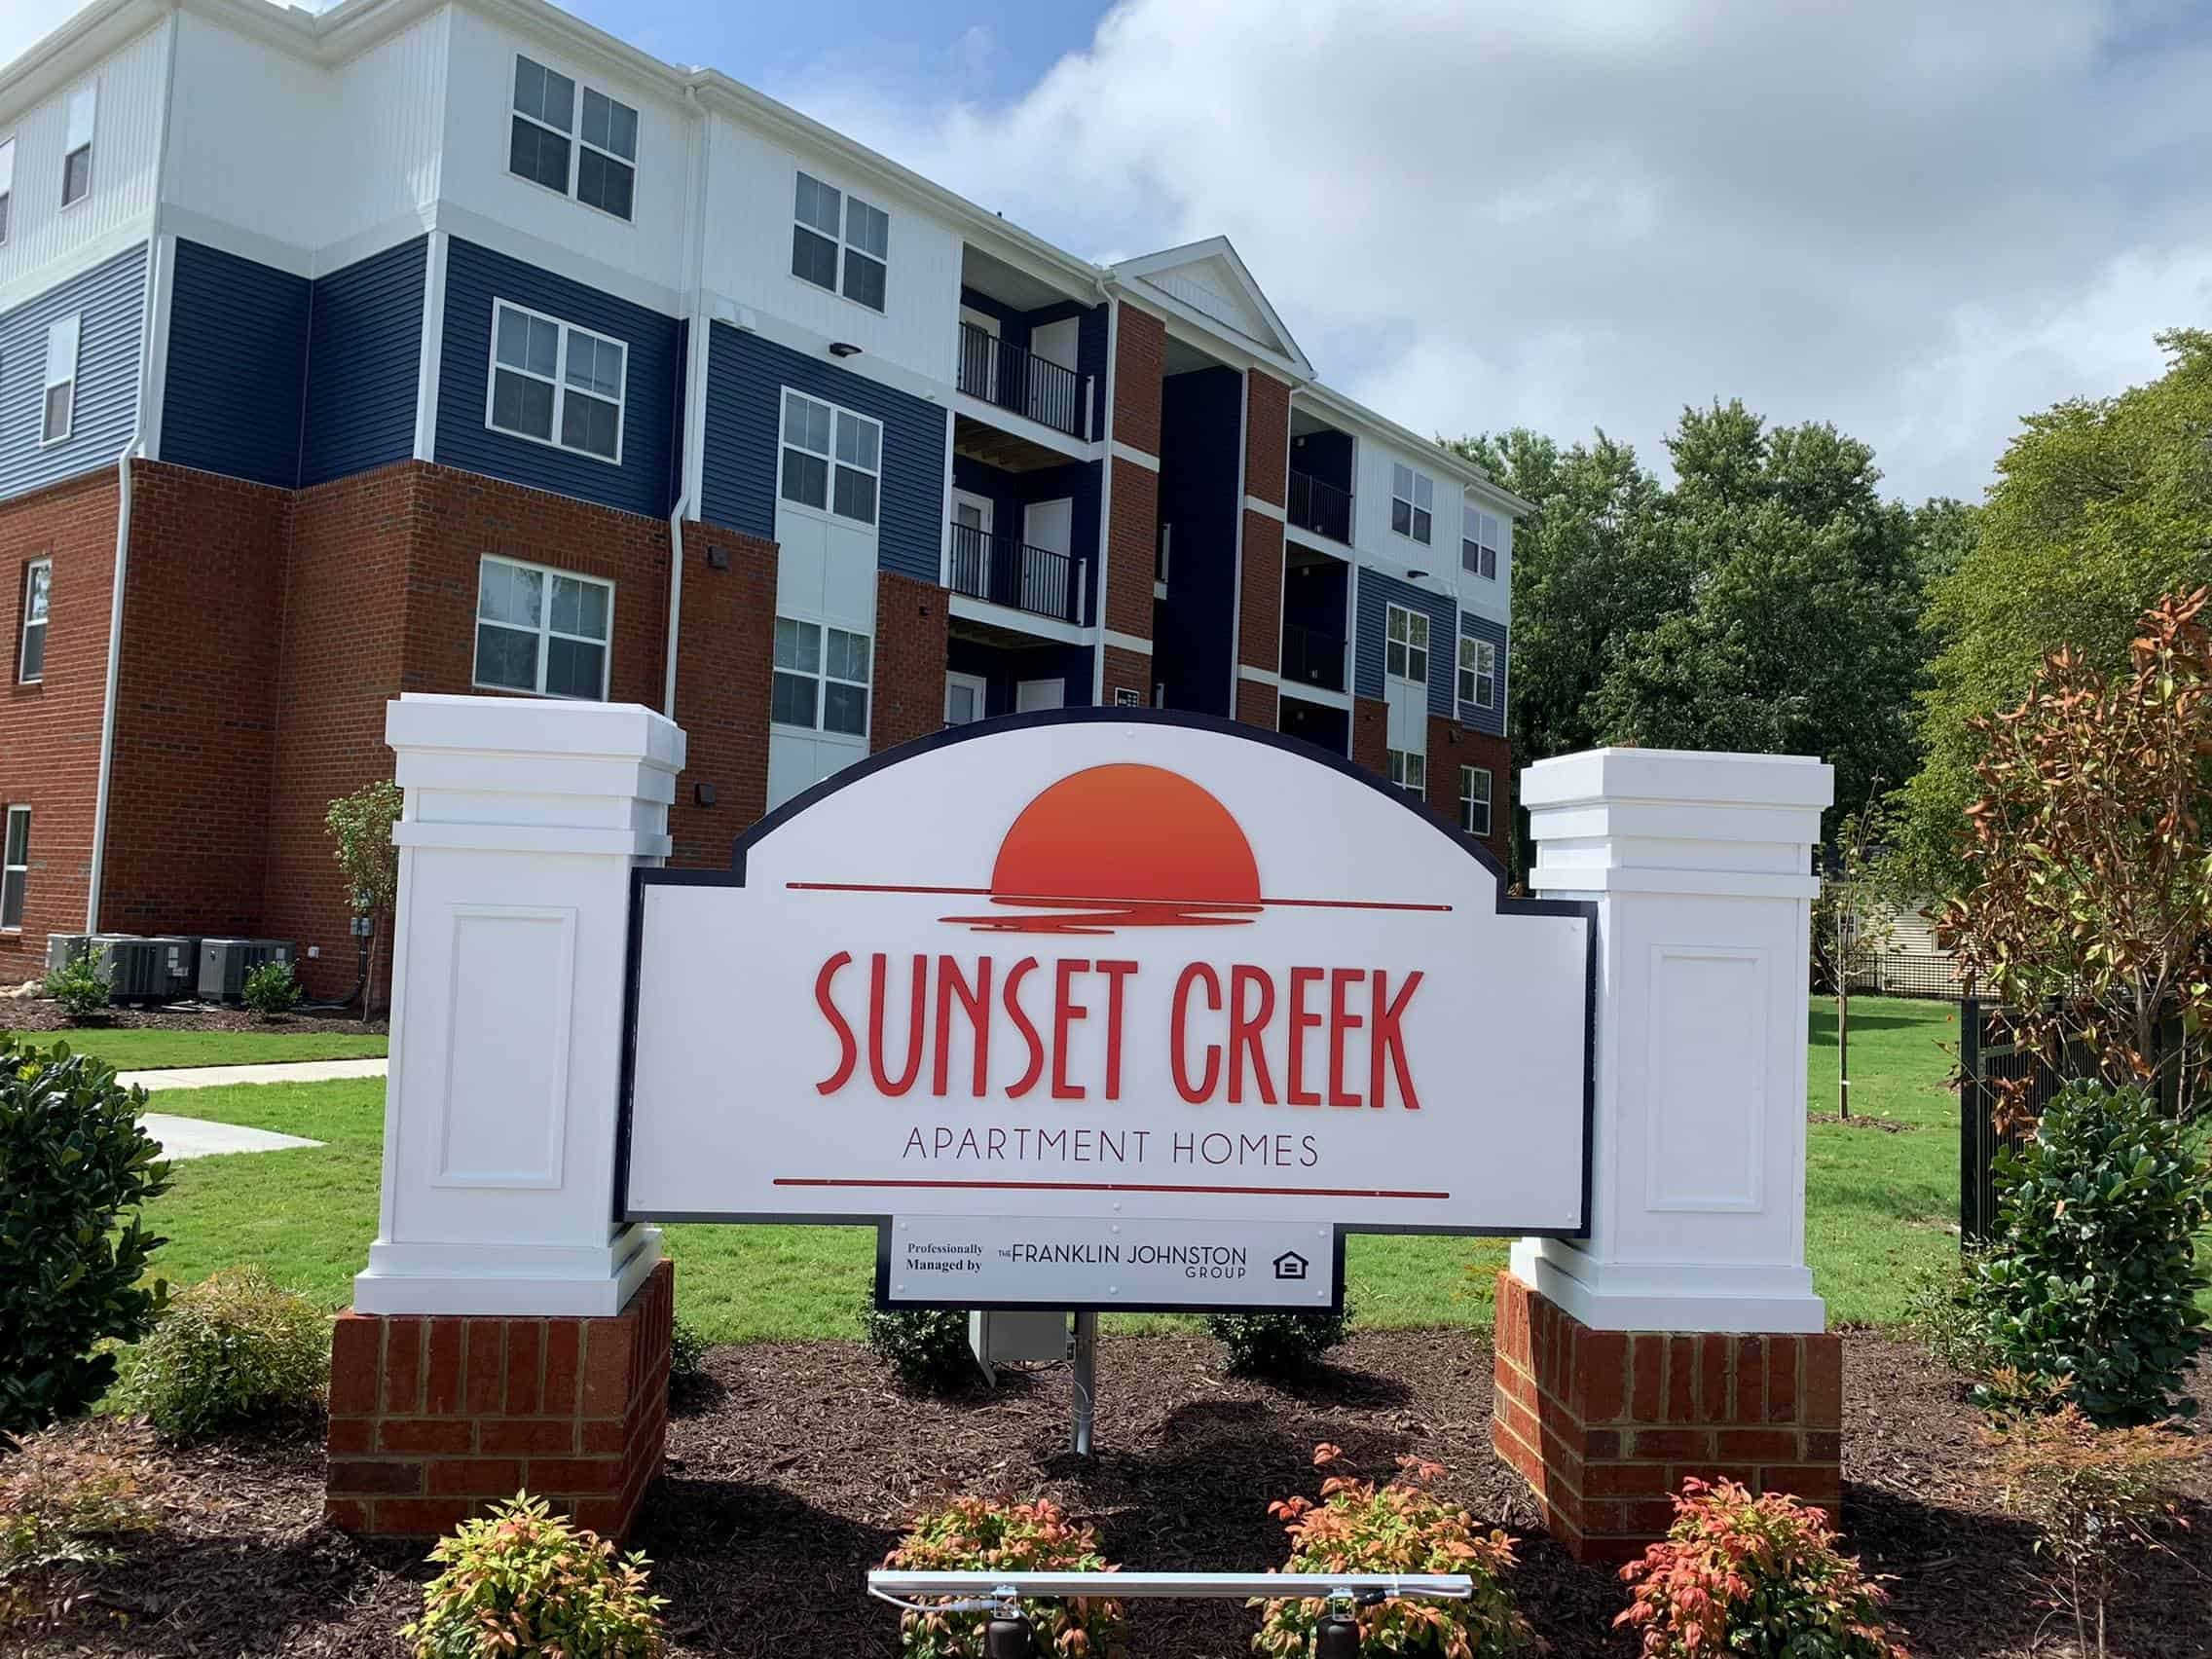 Sunset Creek Apartment Homes Apartments For Rent In Hampton Va